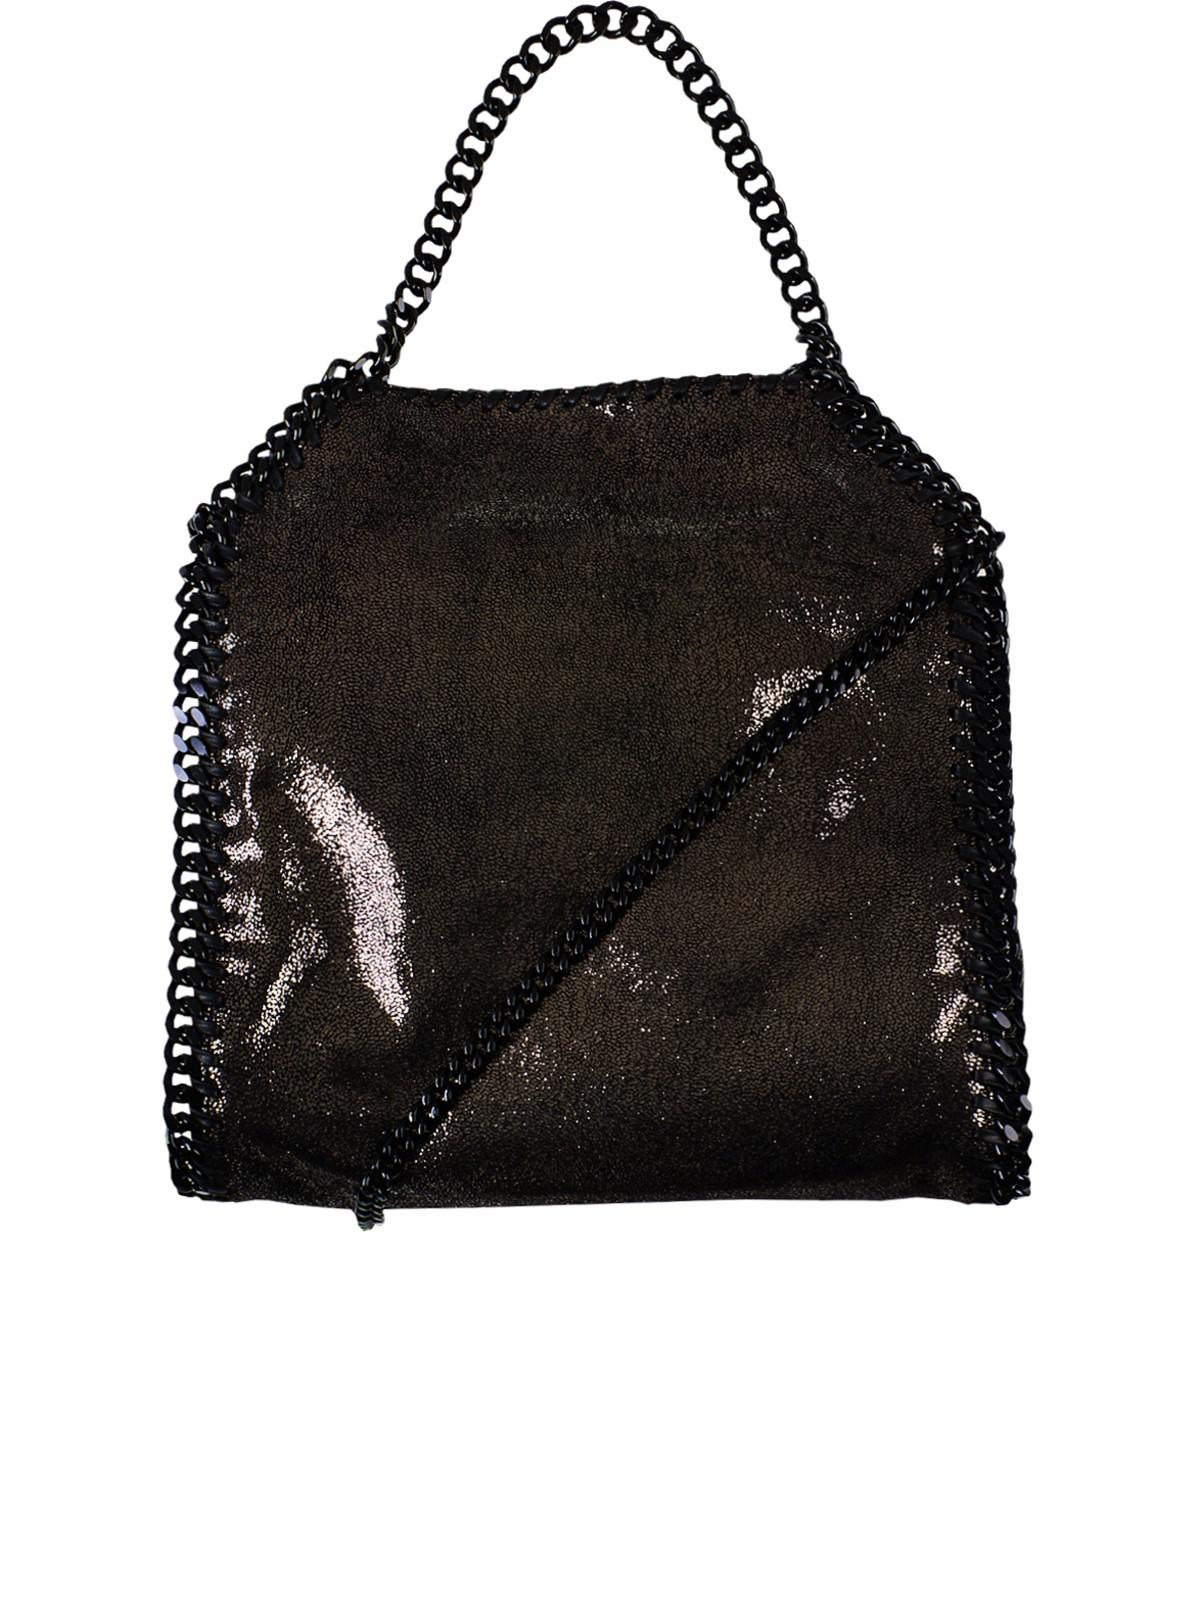 Stella McCartney - Black Small Tote Falabella Crossbody Bag - Lyst. View  fullscreen 21b60a53b43ec